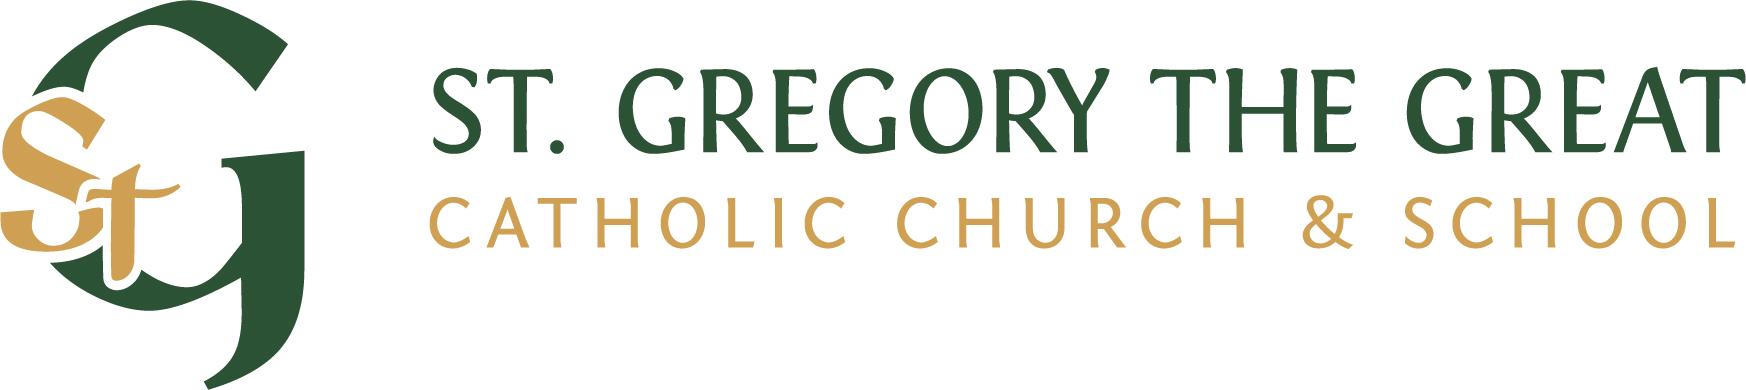 St. Gregory the Great Catholic School logo